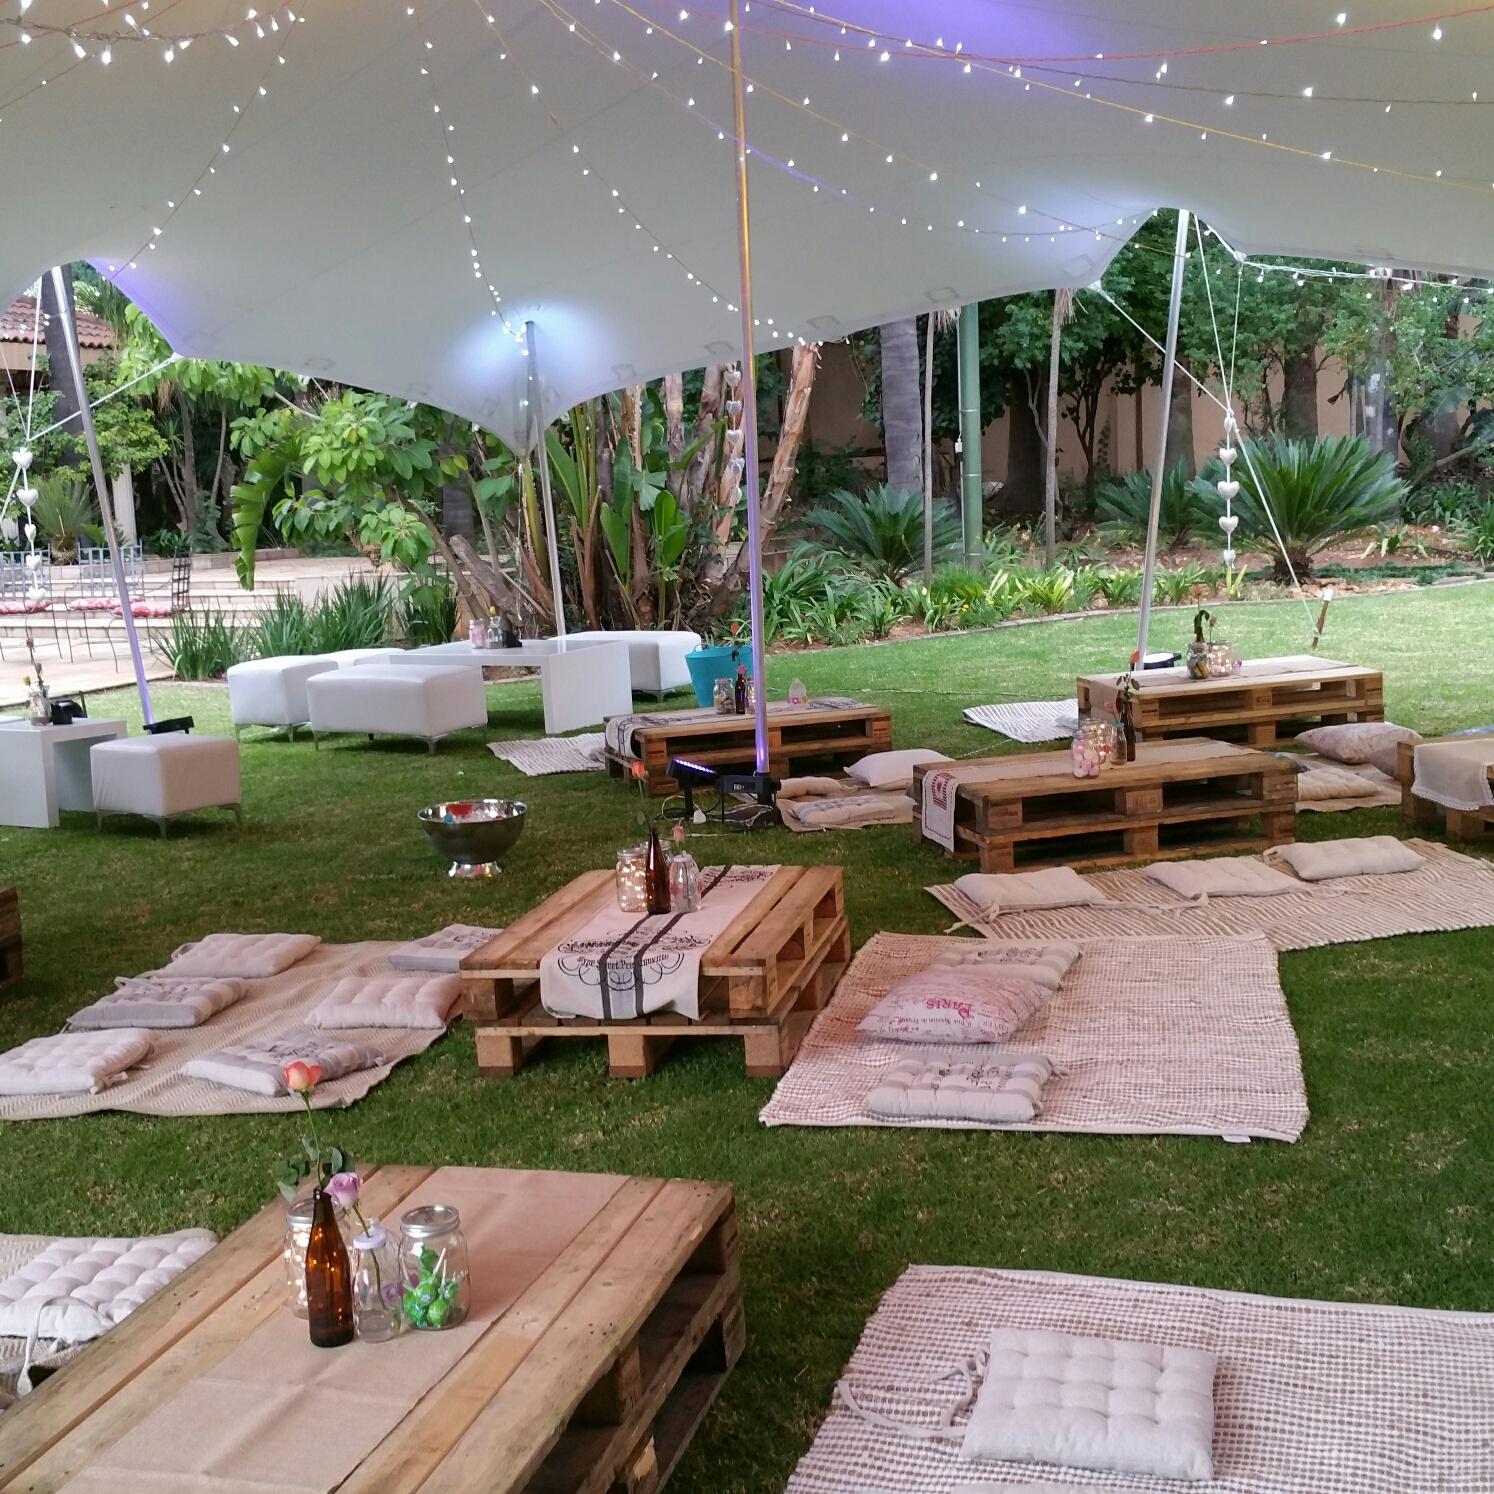 Bohemian Garden Party Decor - Splendid Experiences on Backyard Decor  id=91196